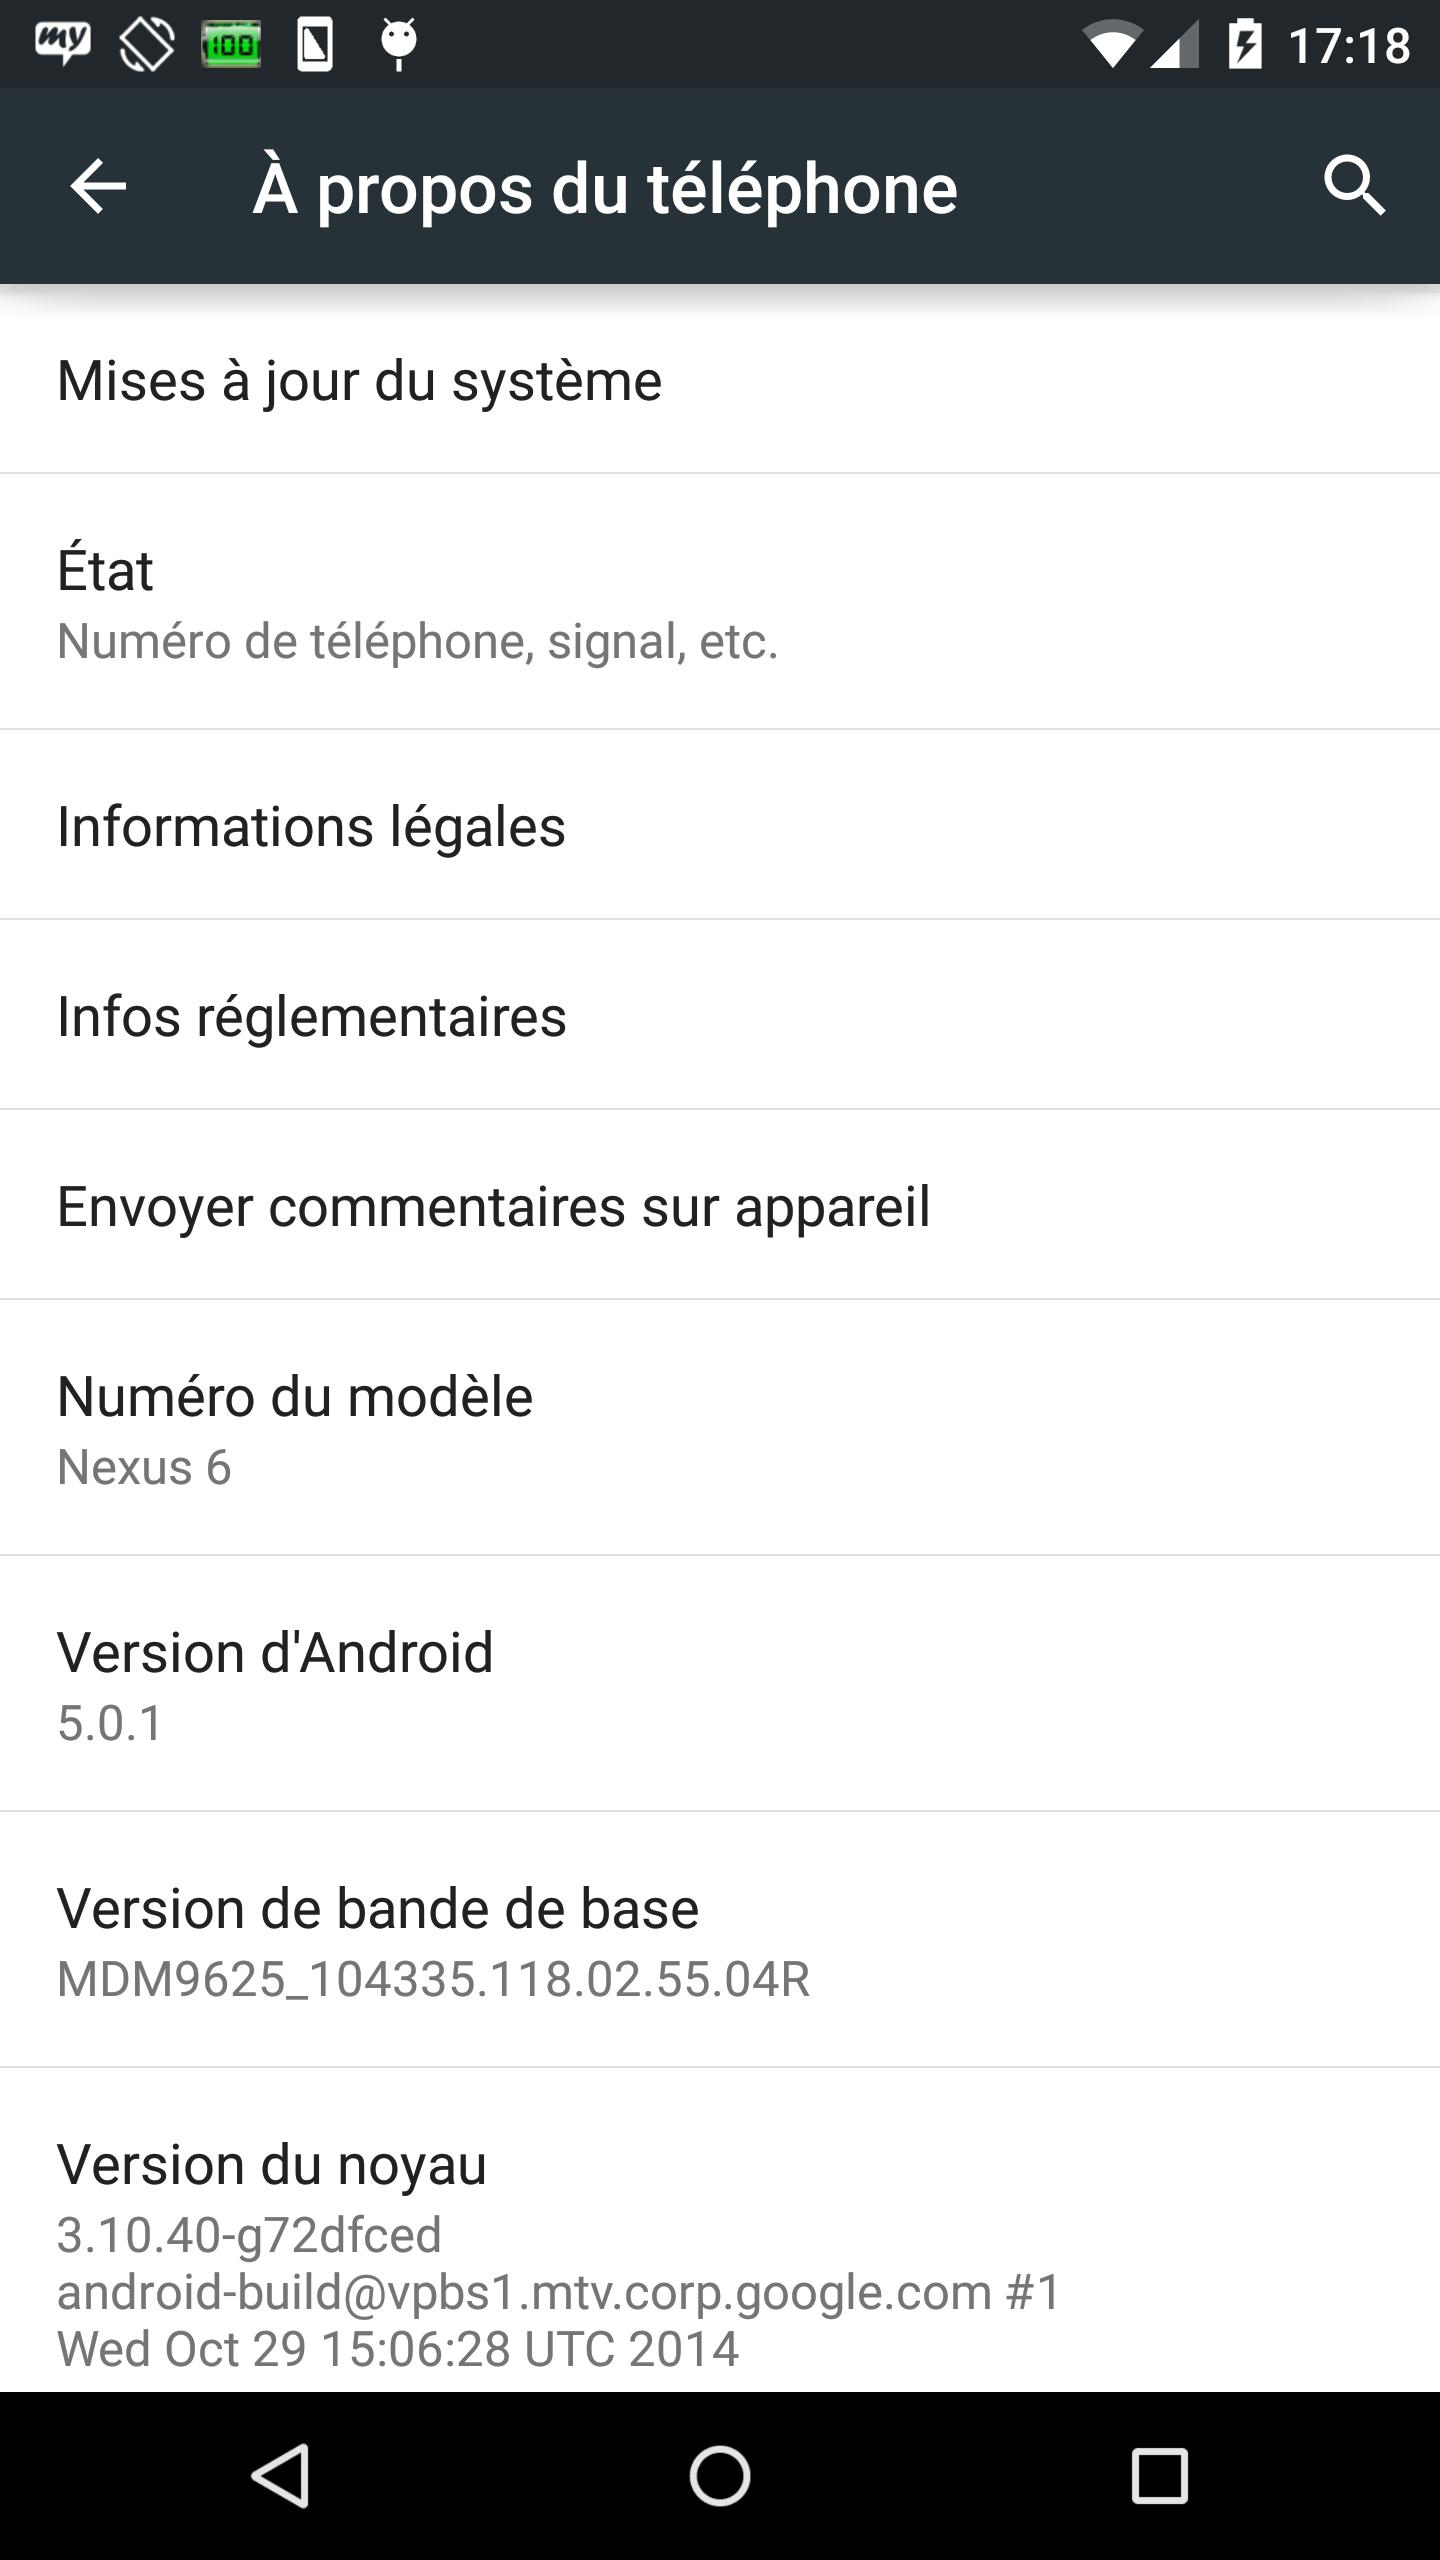 Nexus 6 sous Android 5.0.1